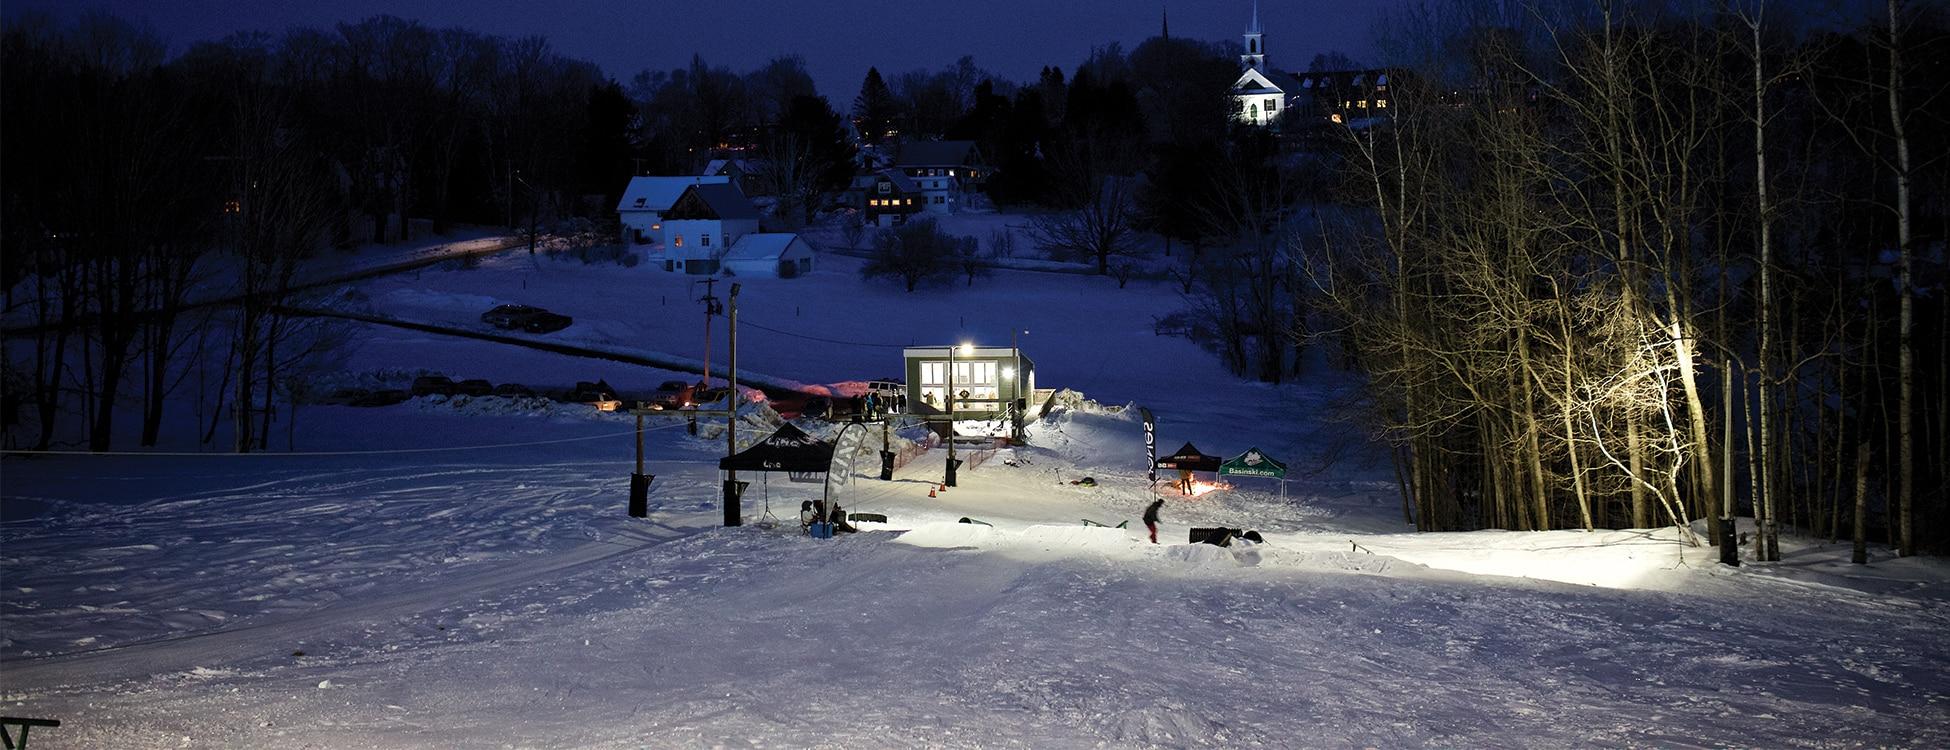 Winter, snow, ski hill, rope tow, Randolph Center campus, night, lights